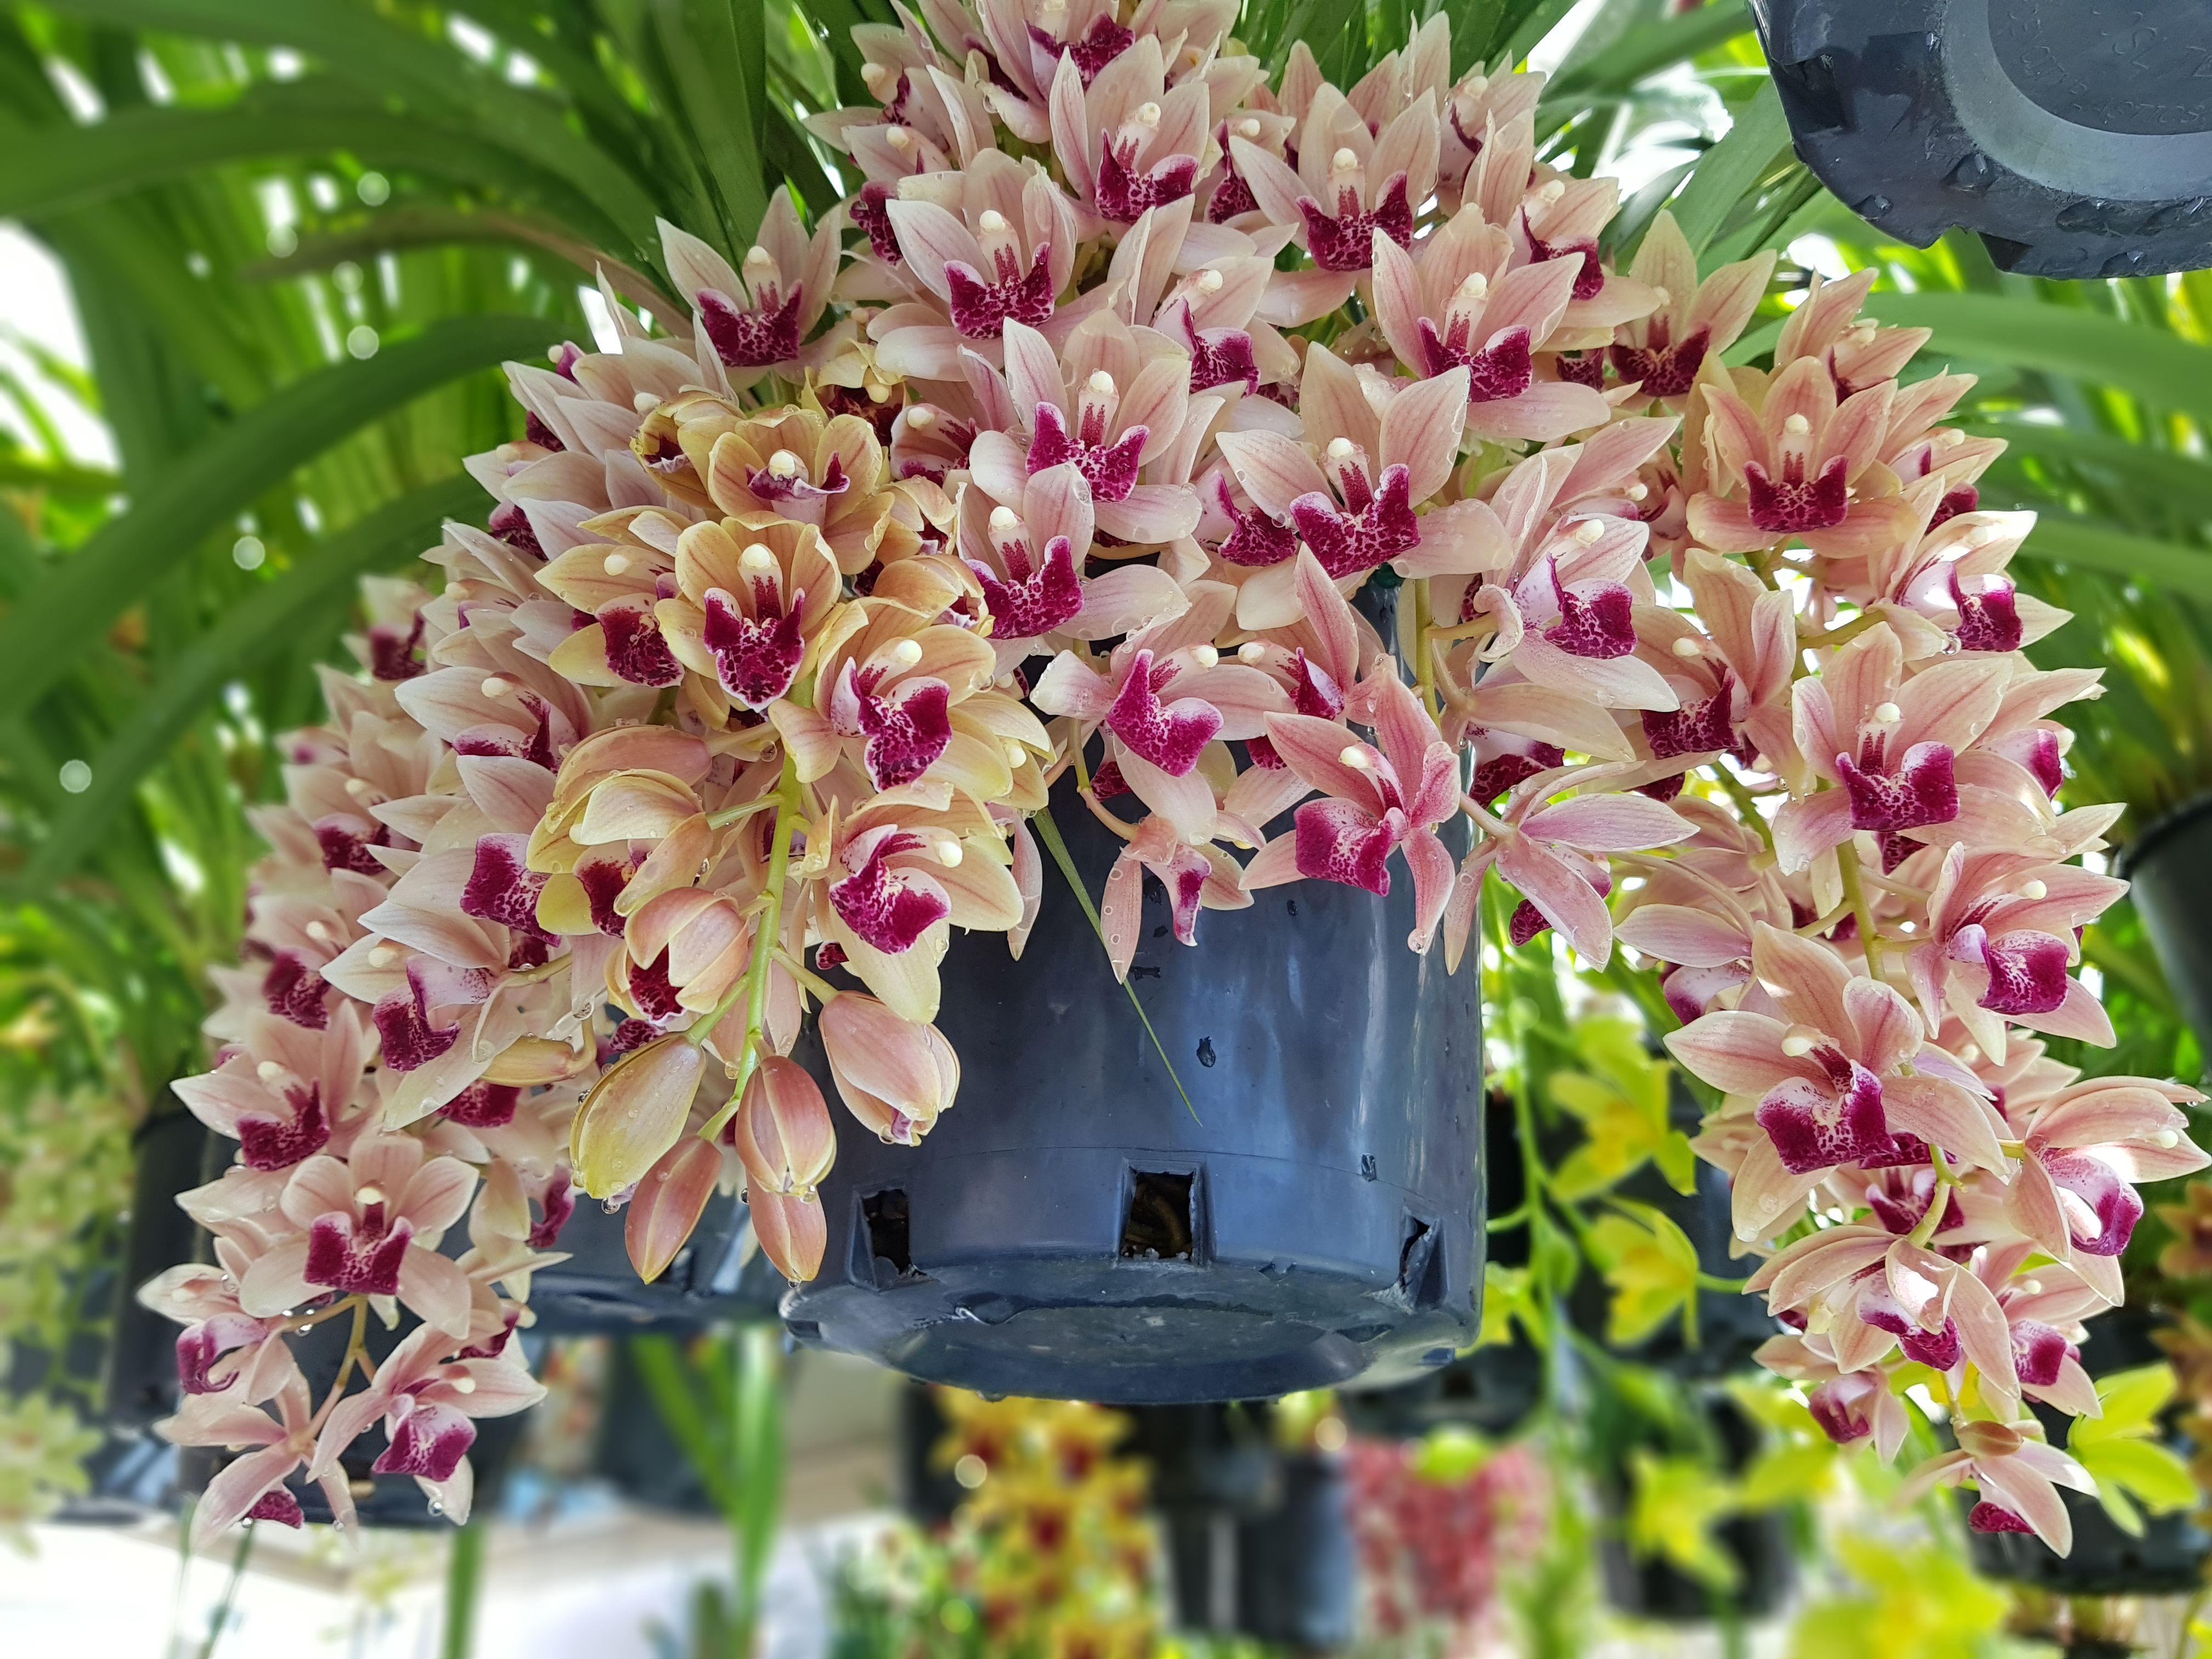 Pin by sineth sor on pharenus orchids garden pinterest orchids